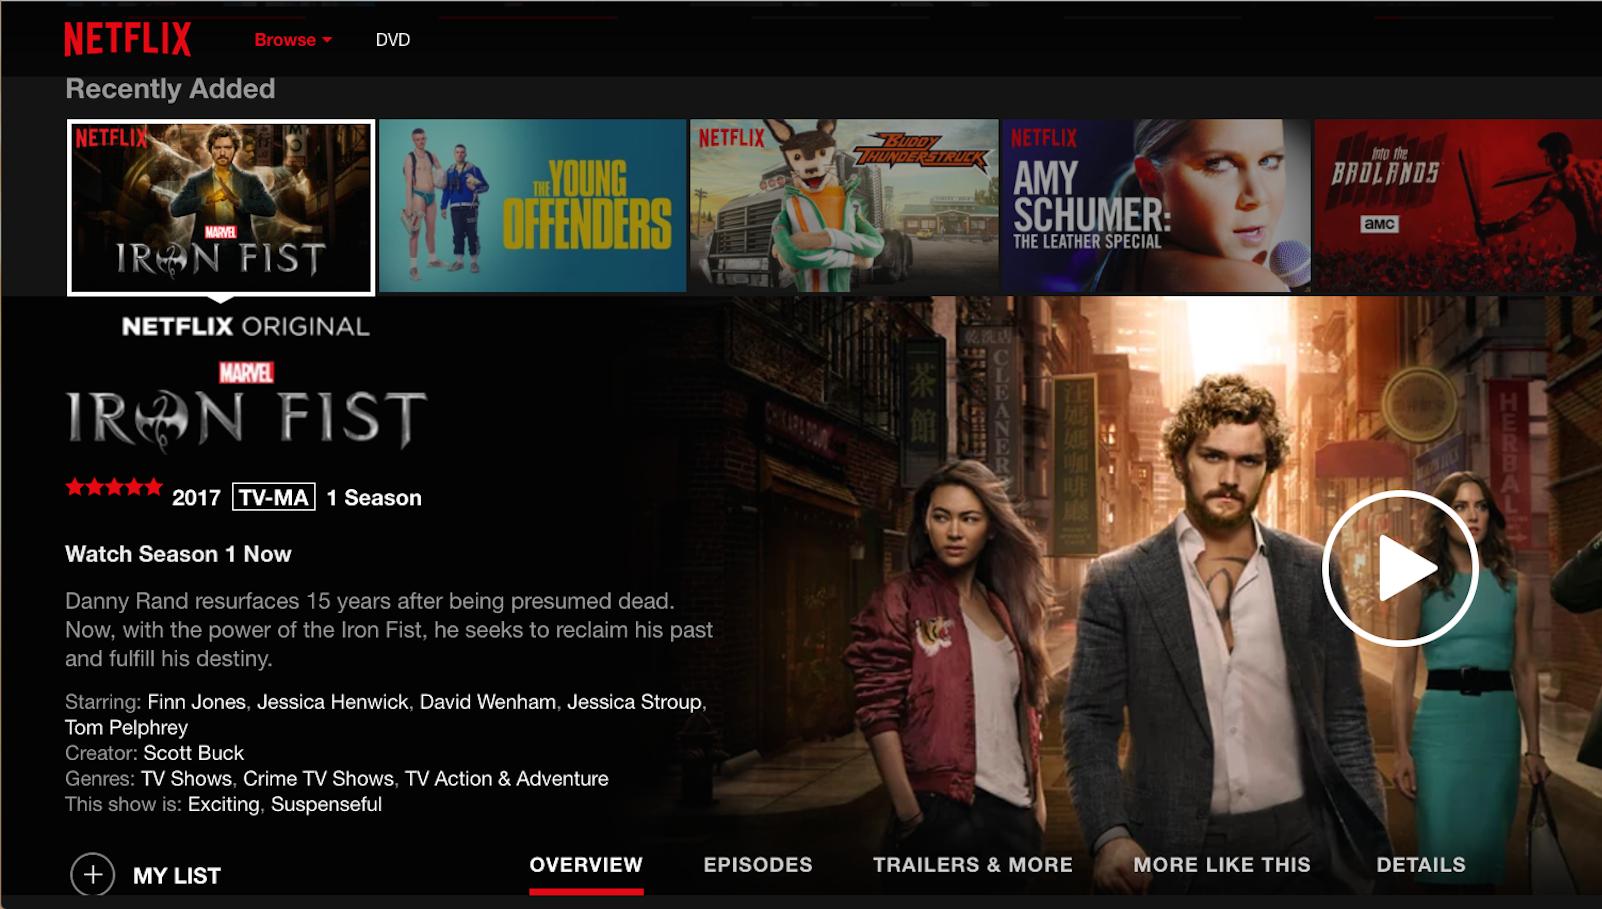 Netflix (NFLX) is nixing its old star-rating system — Quartz